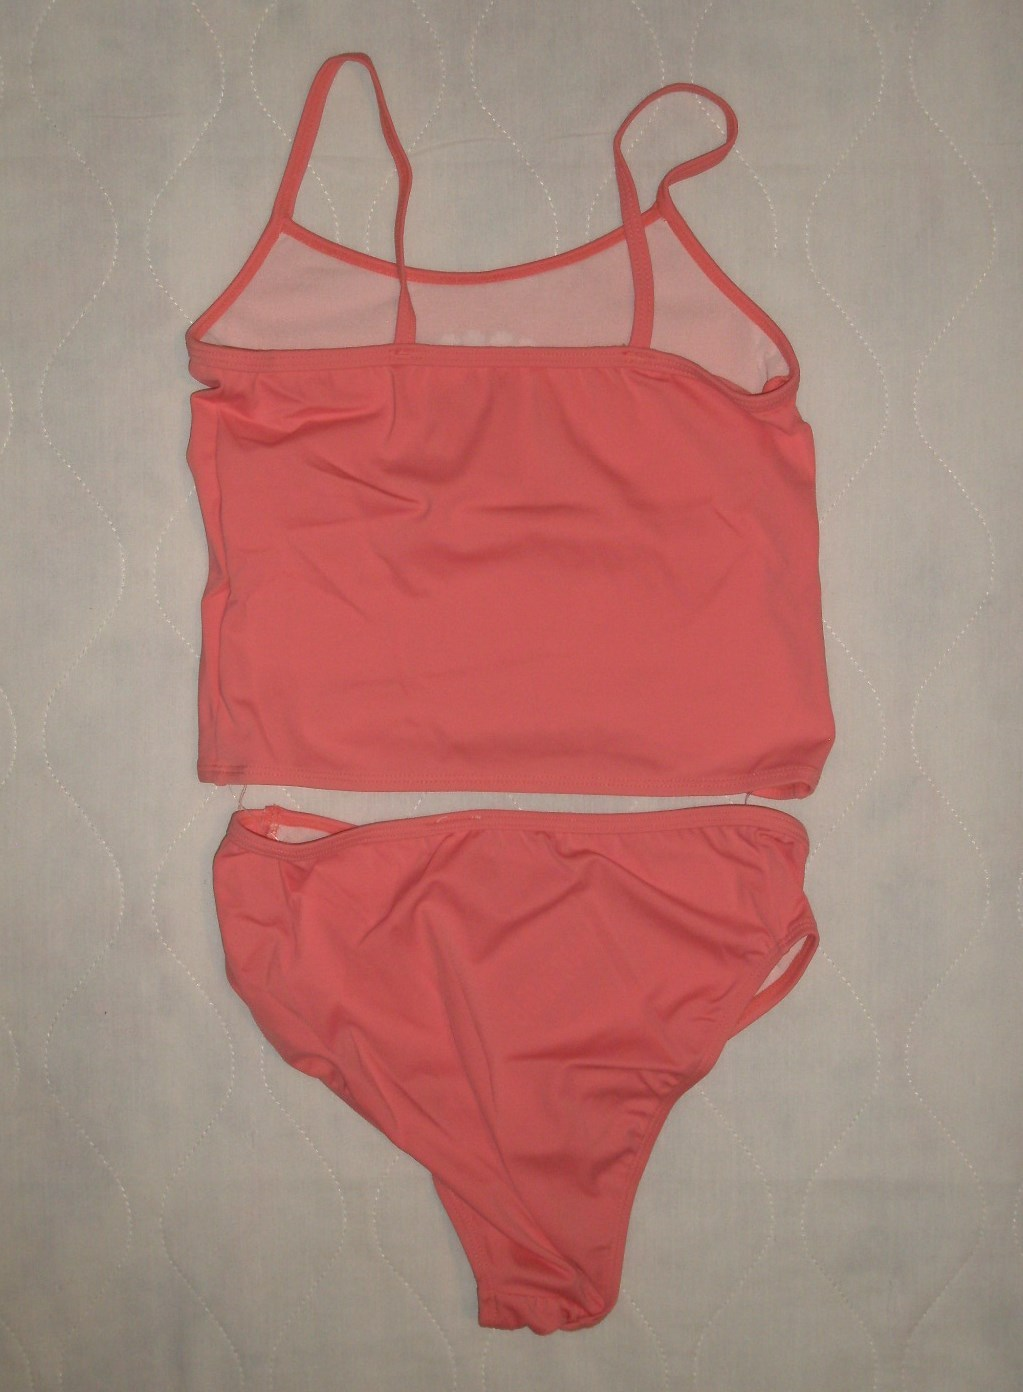 New Nwt Gymboree Pink Starfish Swimsuit Sz 4t New Upf 50